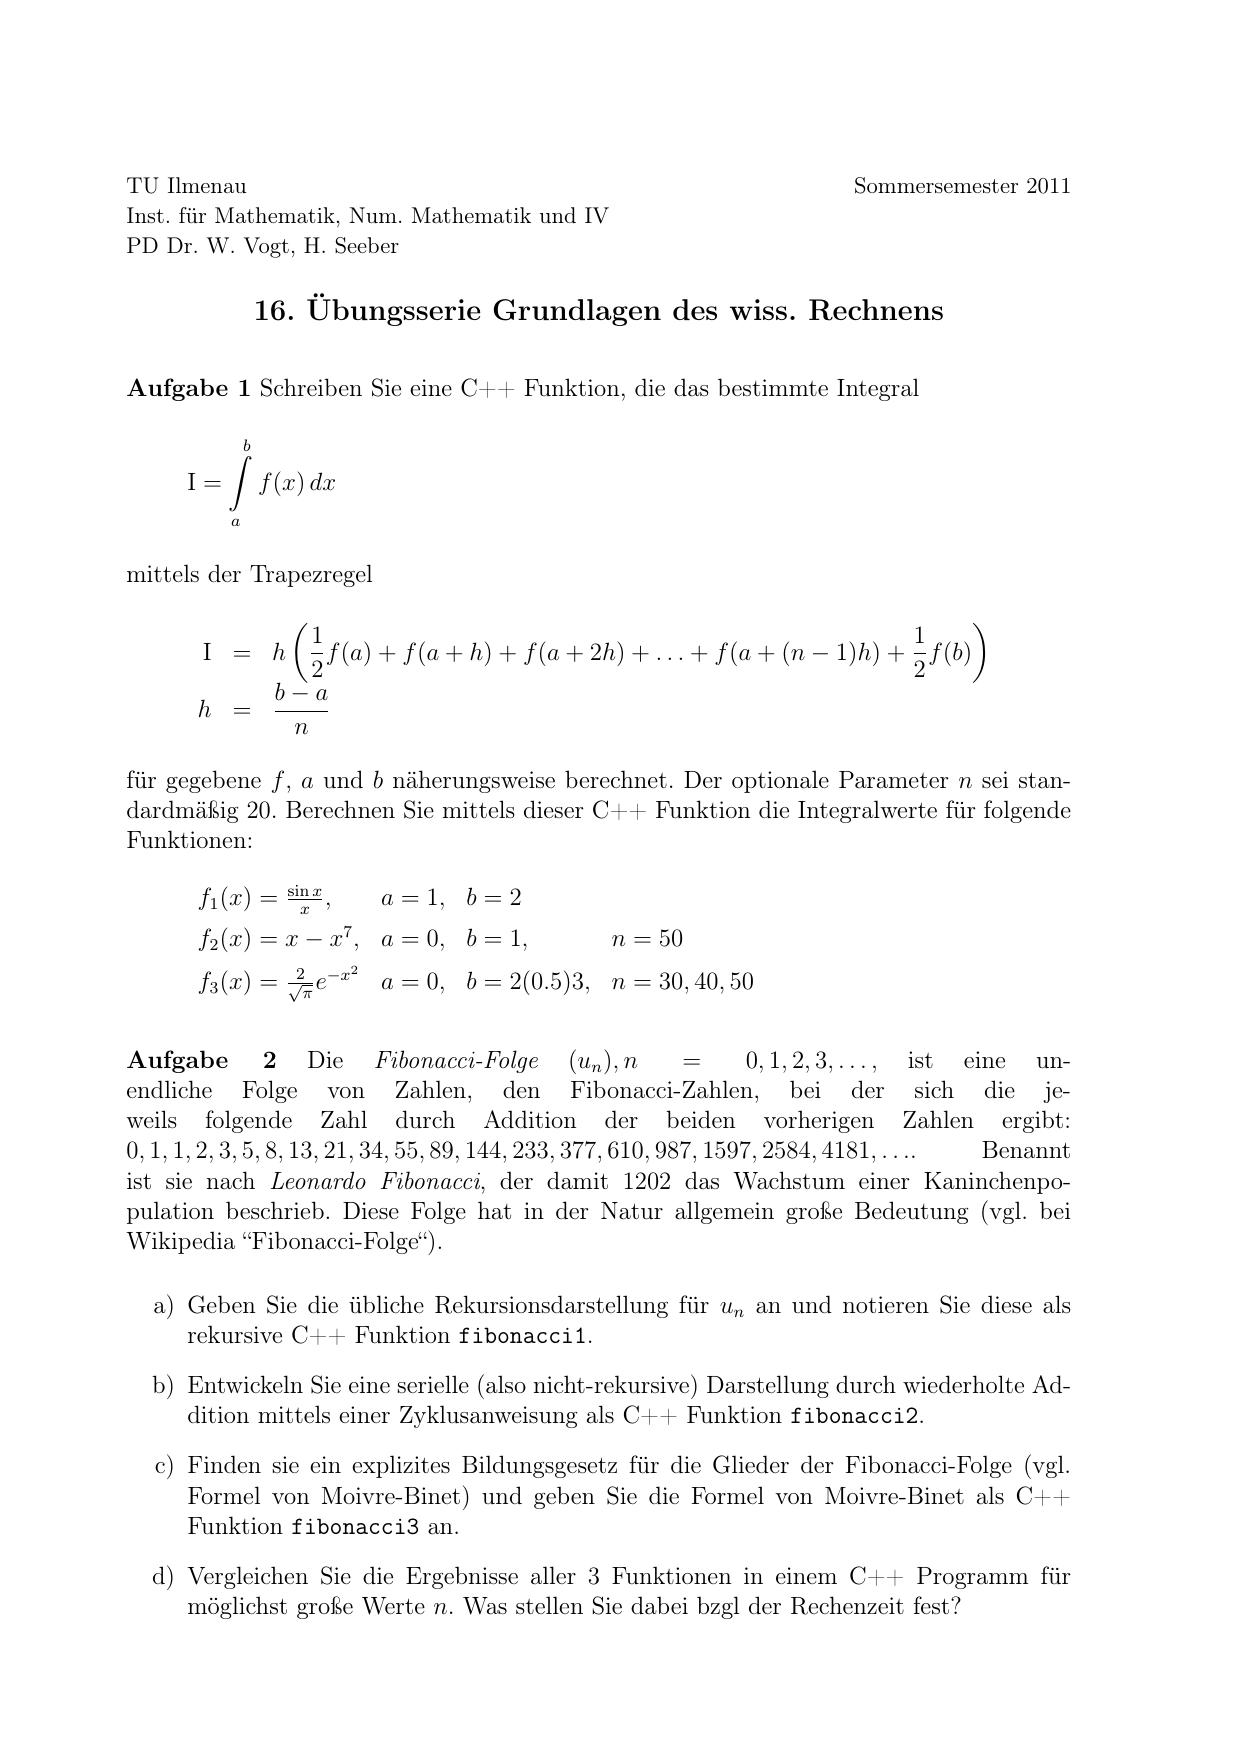 Großartig Arithmetik Rekursive Und Explizite Arbeitsblatt Bilder ...